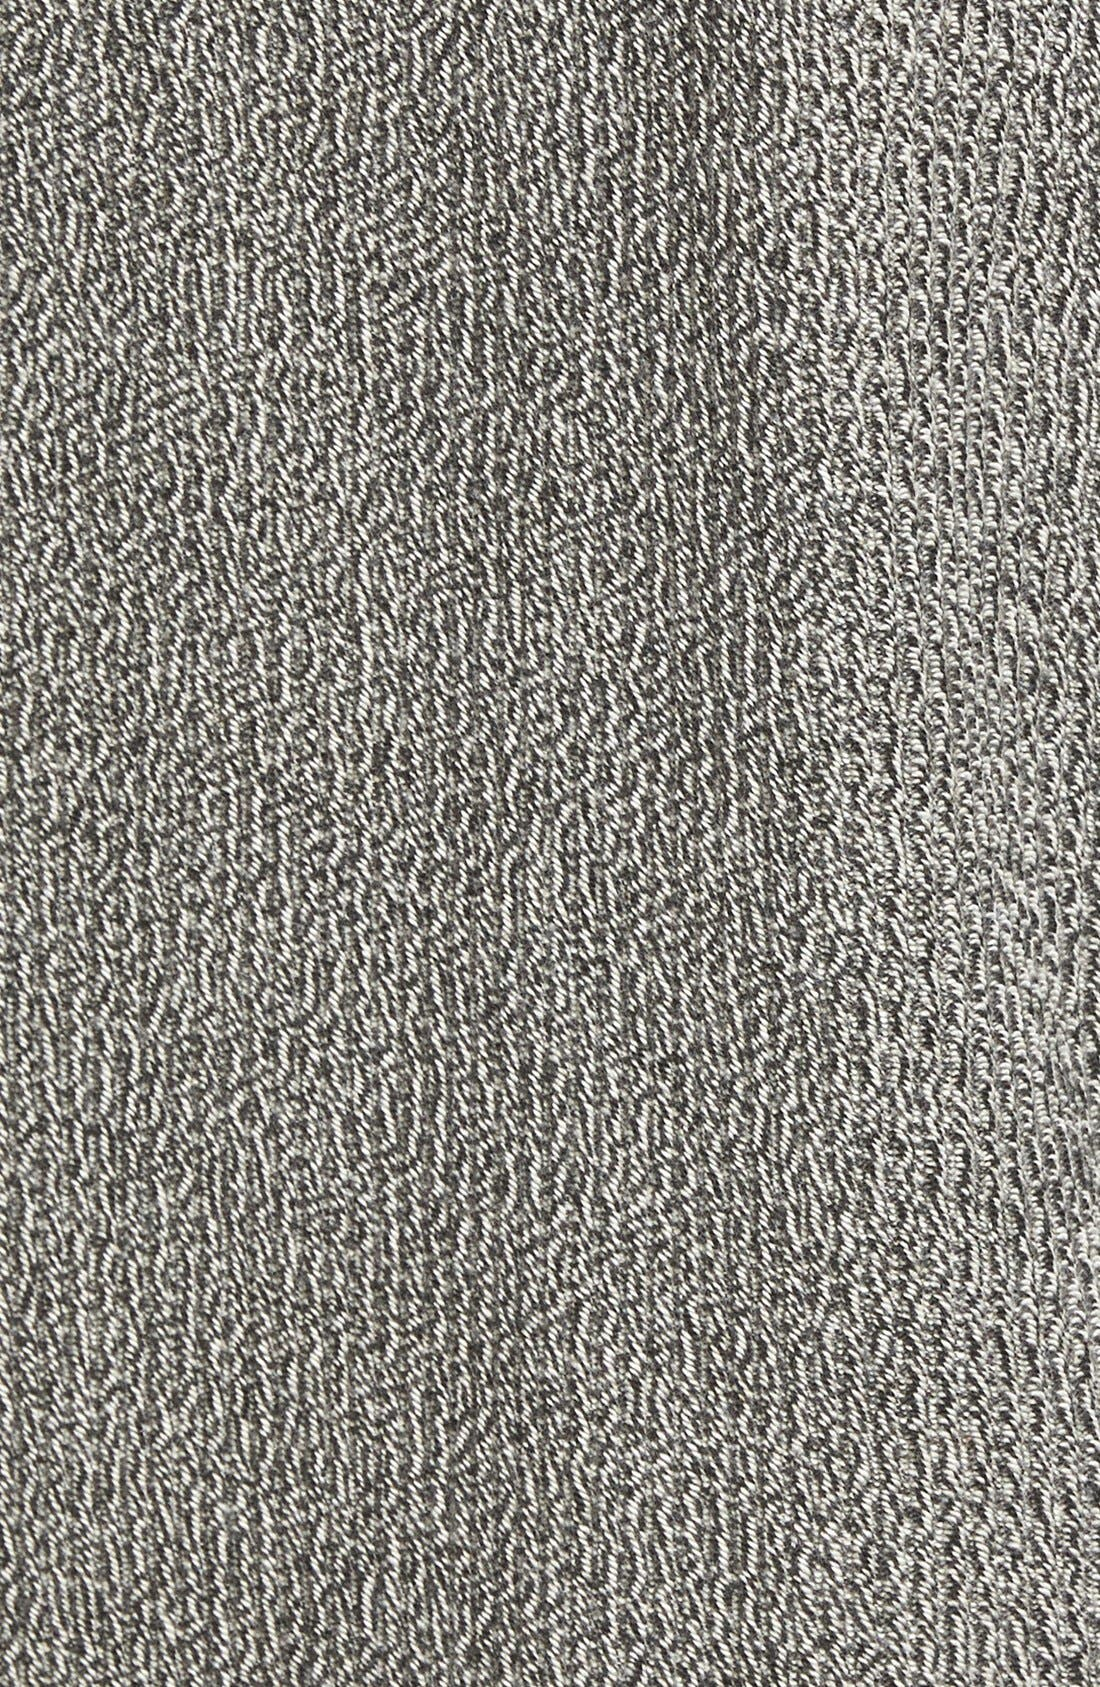 Alternate Image 3  - MadewellRib Funnel Neck Top